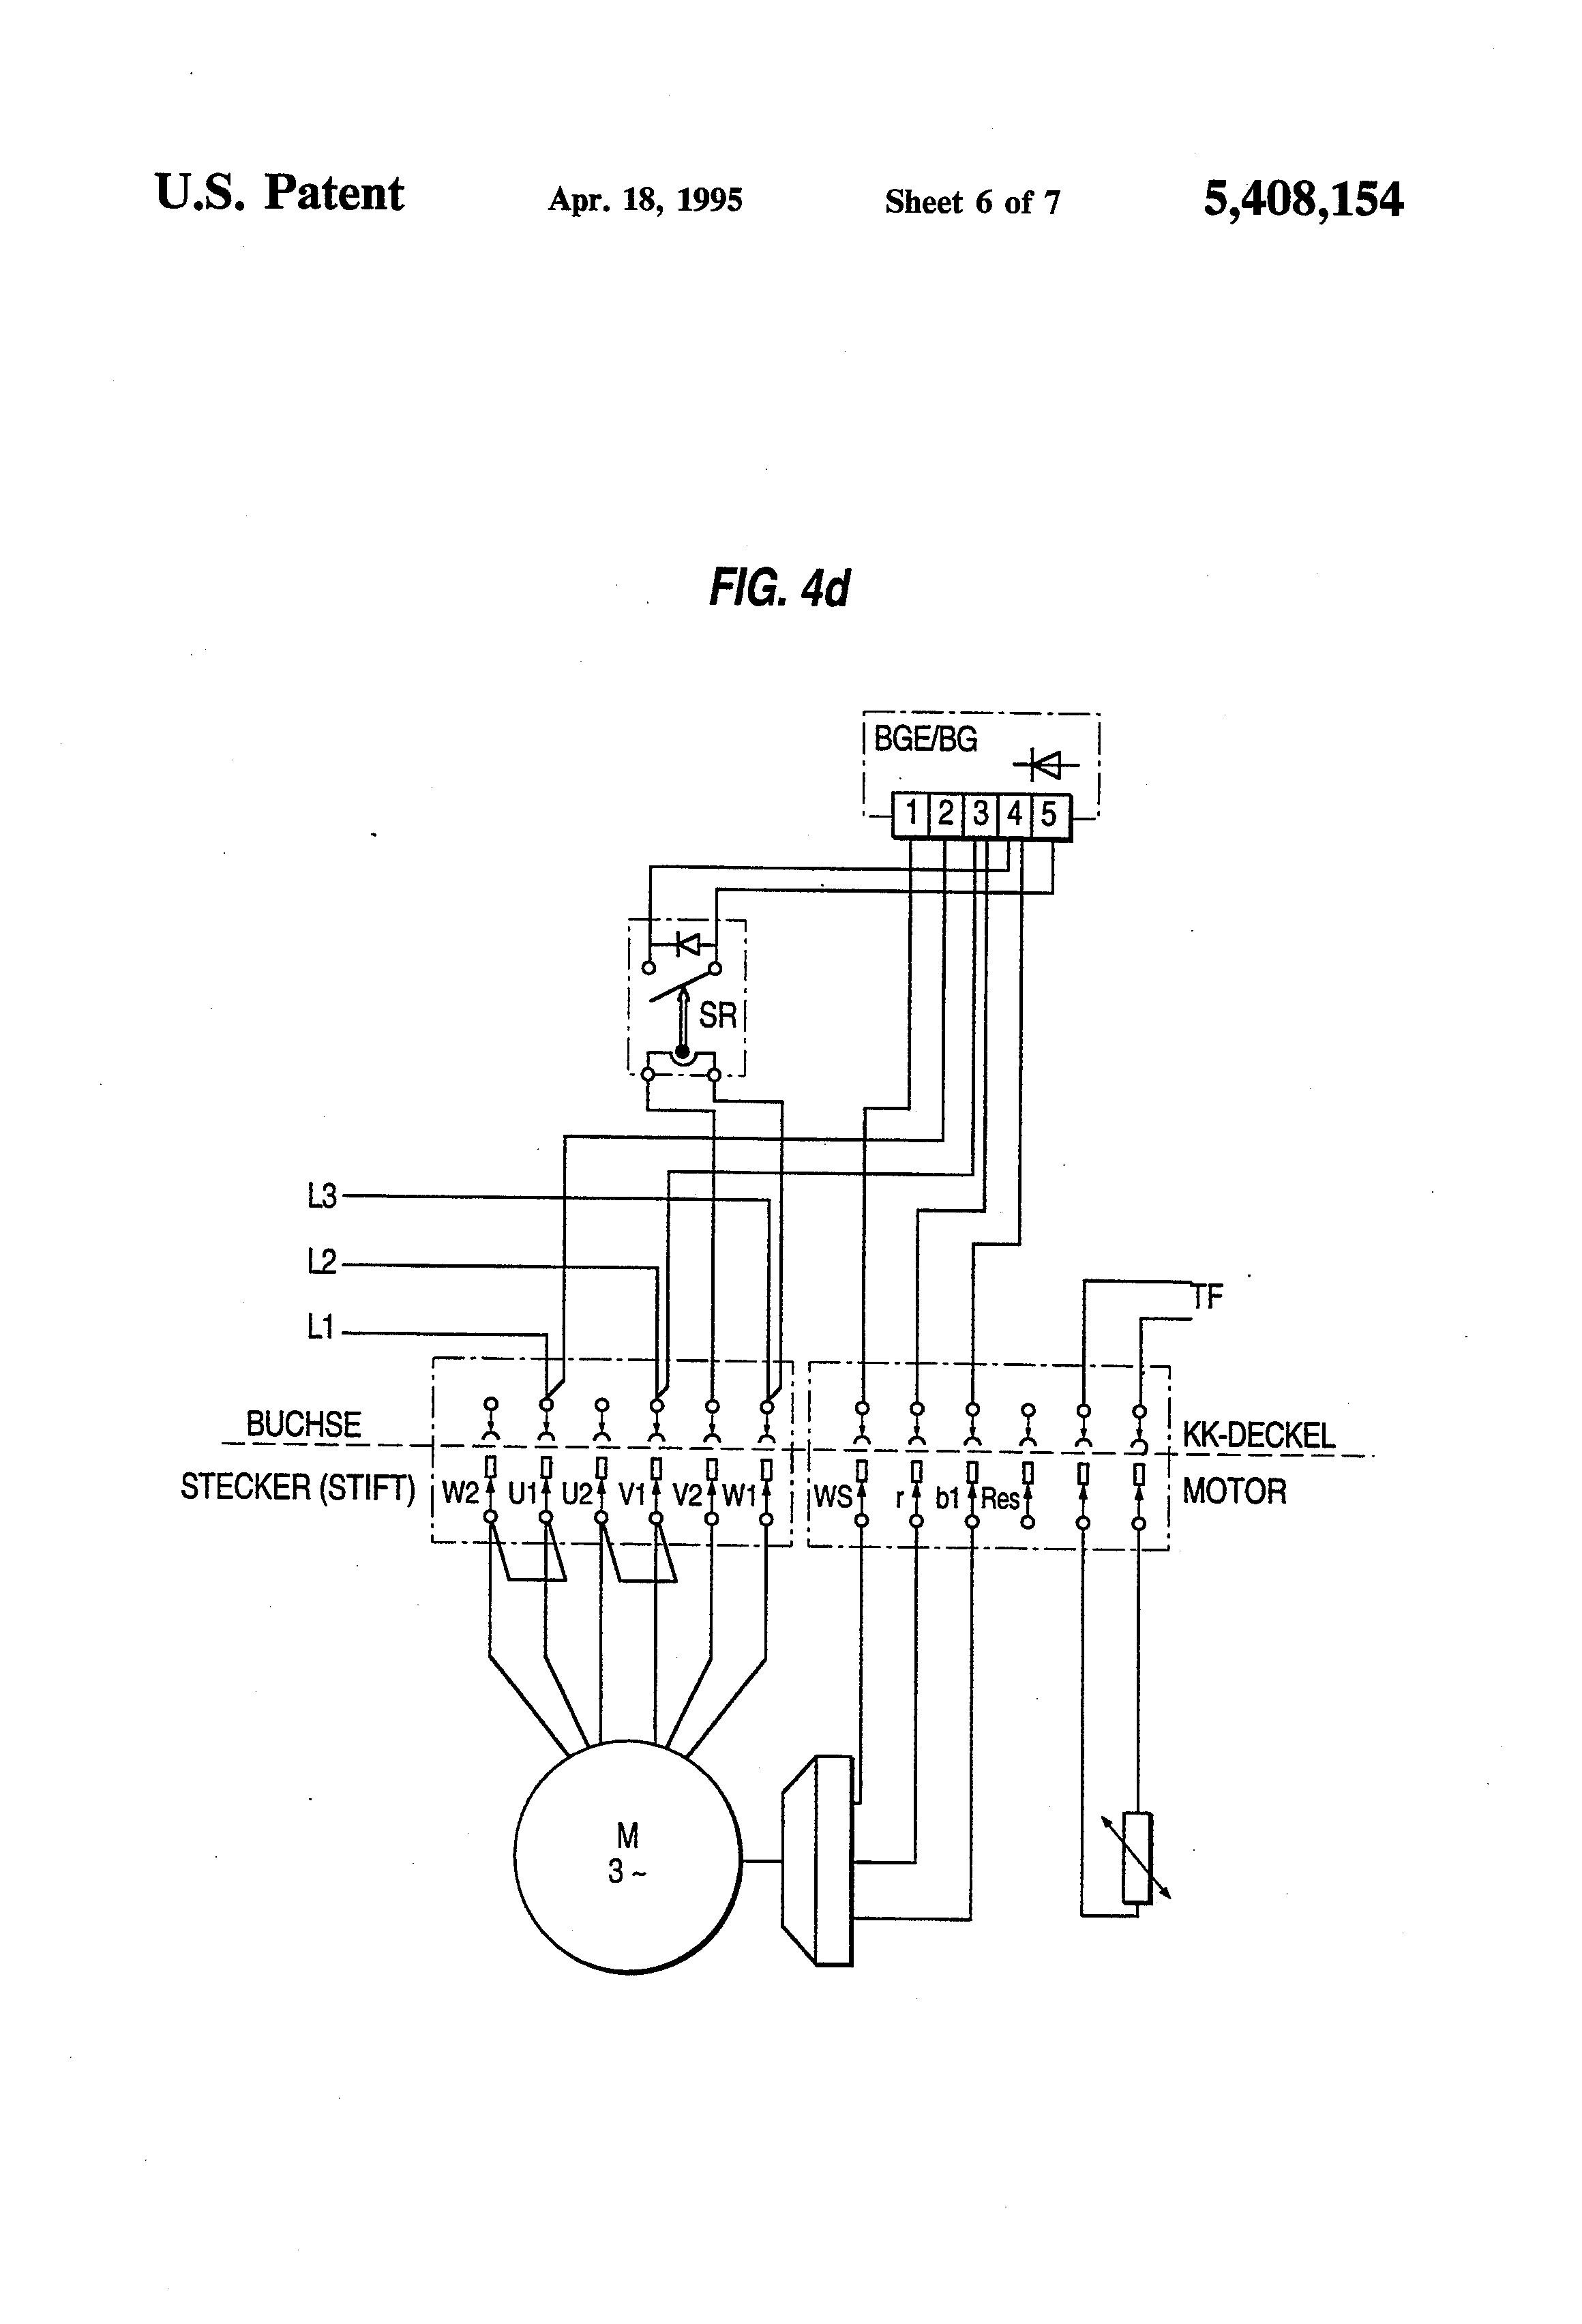 208 volt wiring diagram schematics diagram rh leonardofaccoeditore com 208 volt wiring diagram for parking lot light 208/230 volt wiring diagram